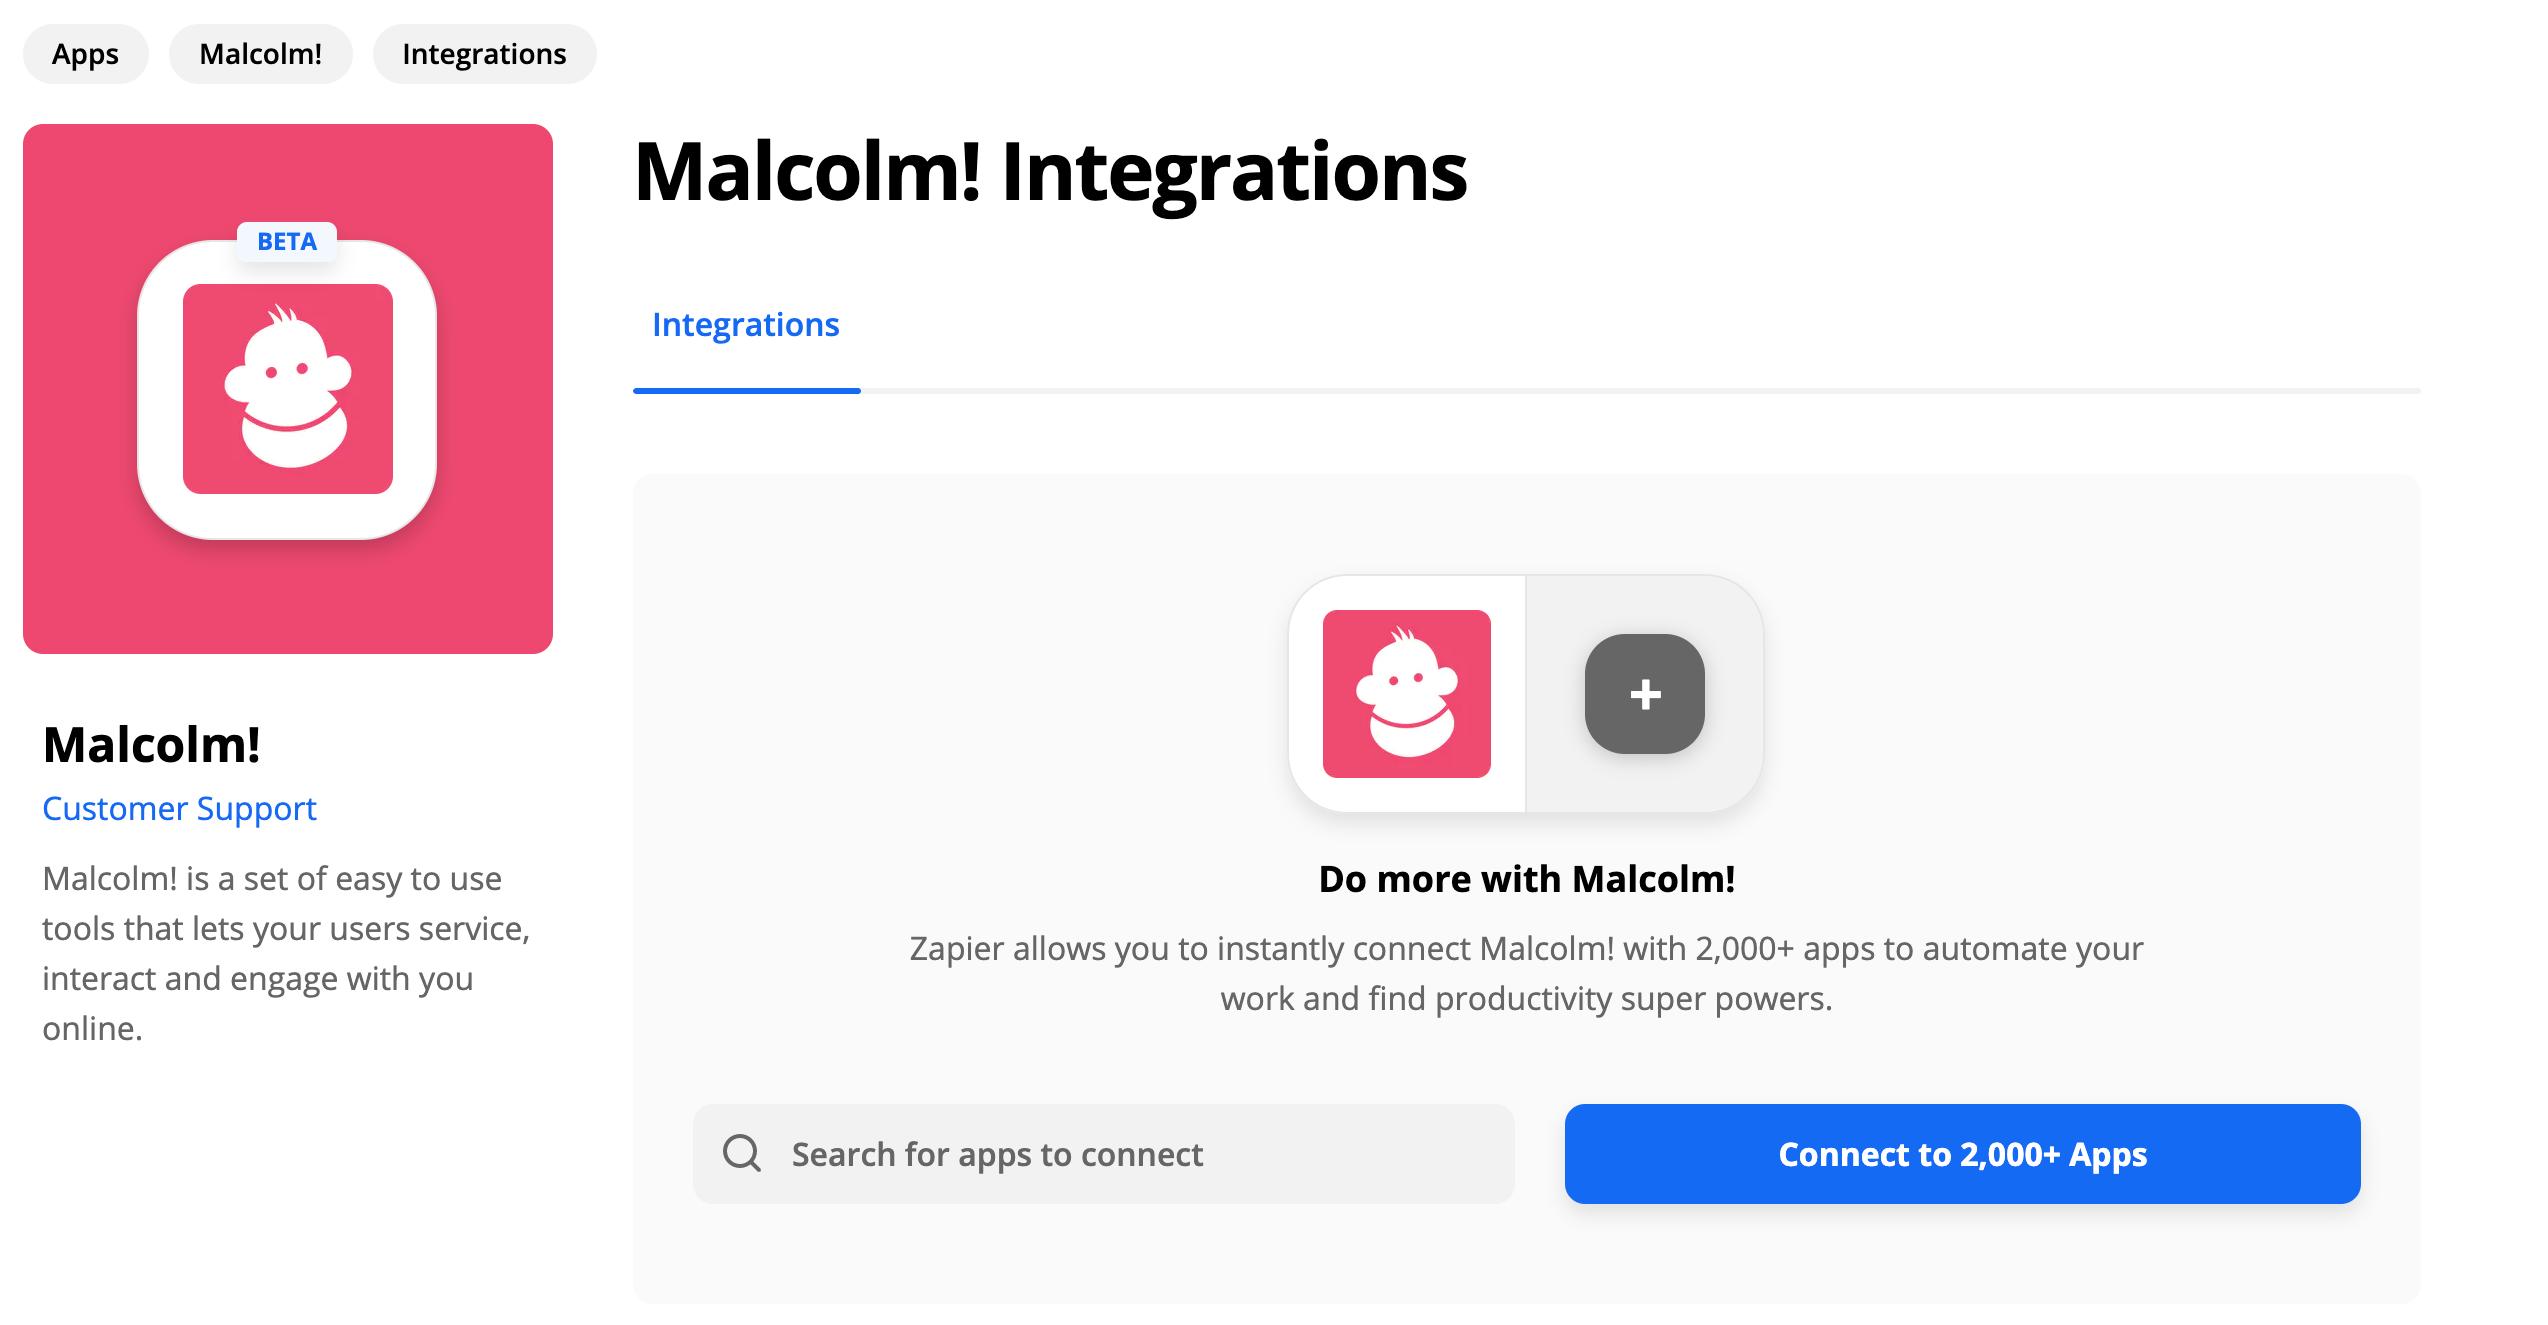 Malcolm! on Zapier